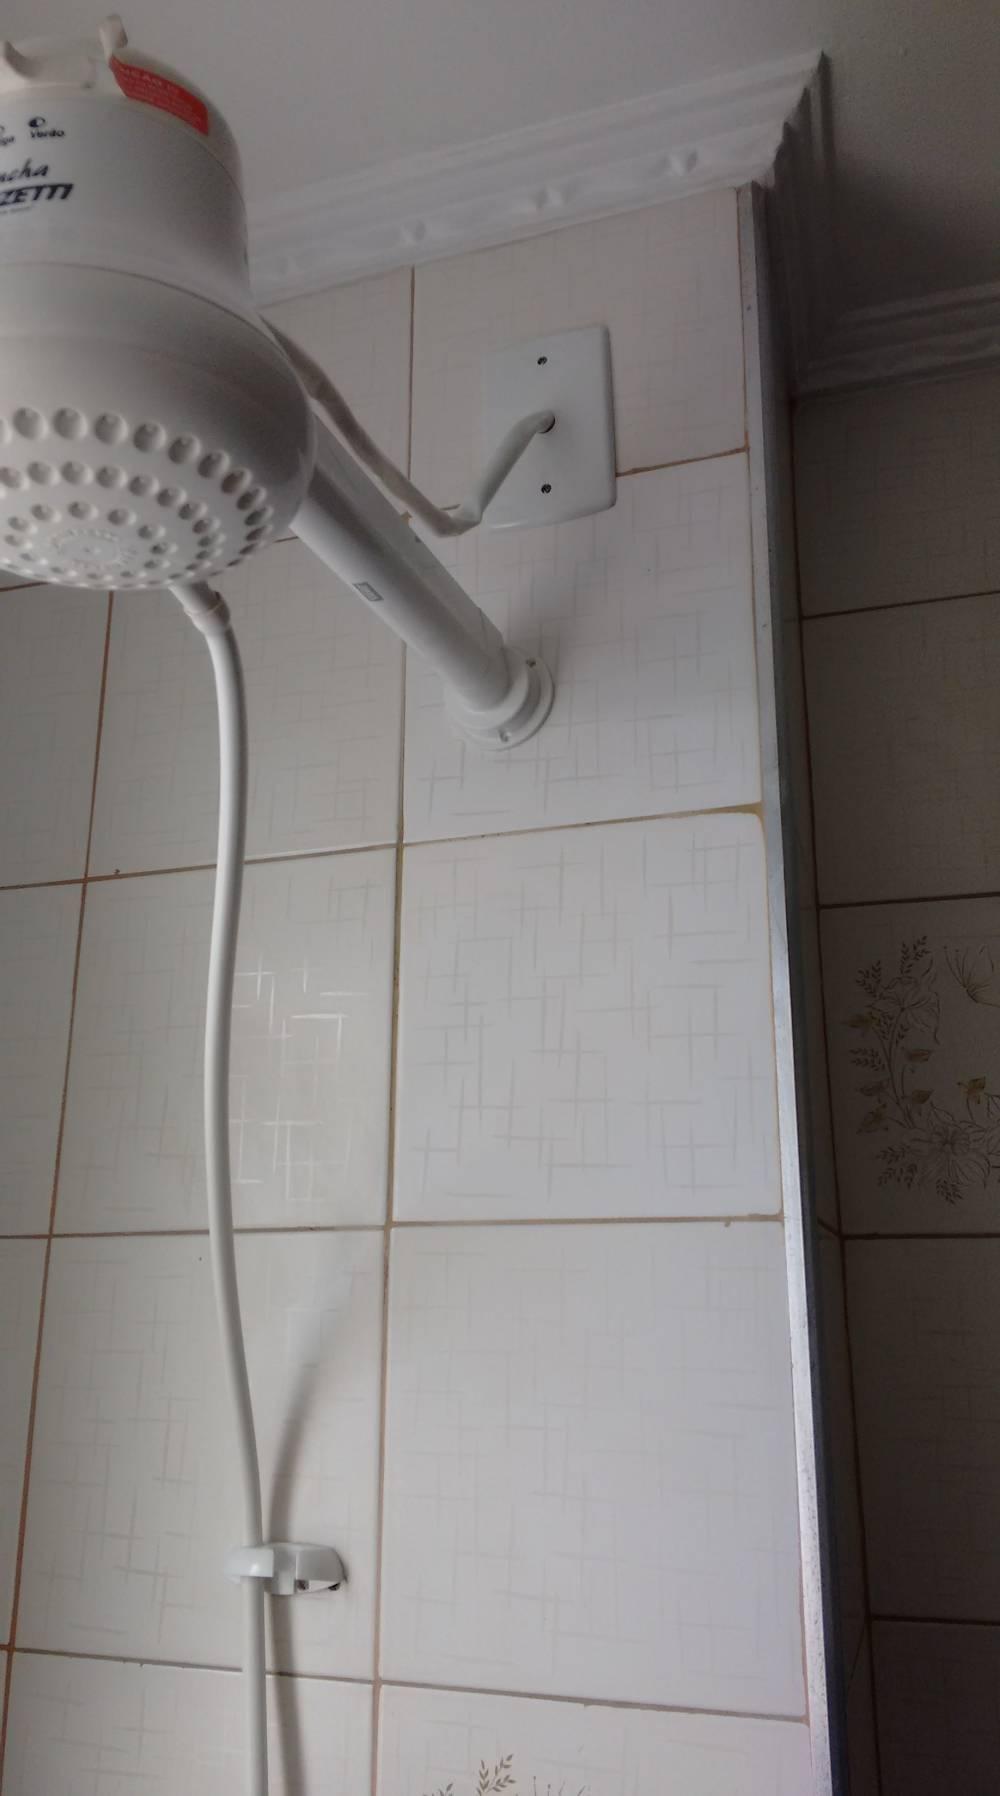 Contratar Alguém para Trocar Chuveiro na Vila Independência - Troca de Chuveiro na Zona Norte